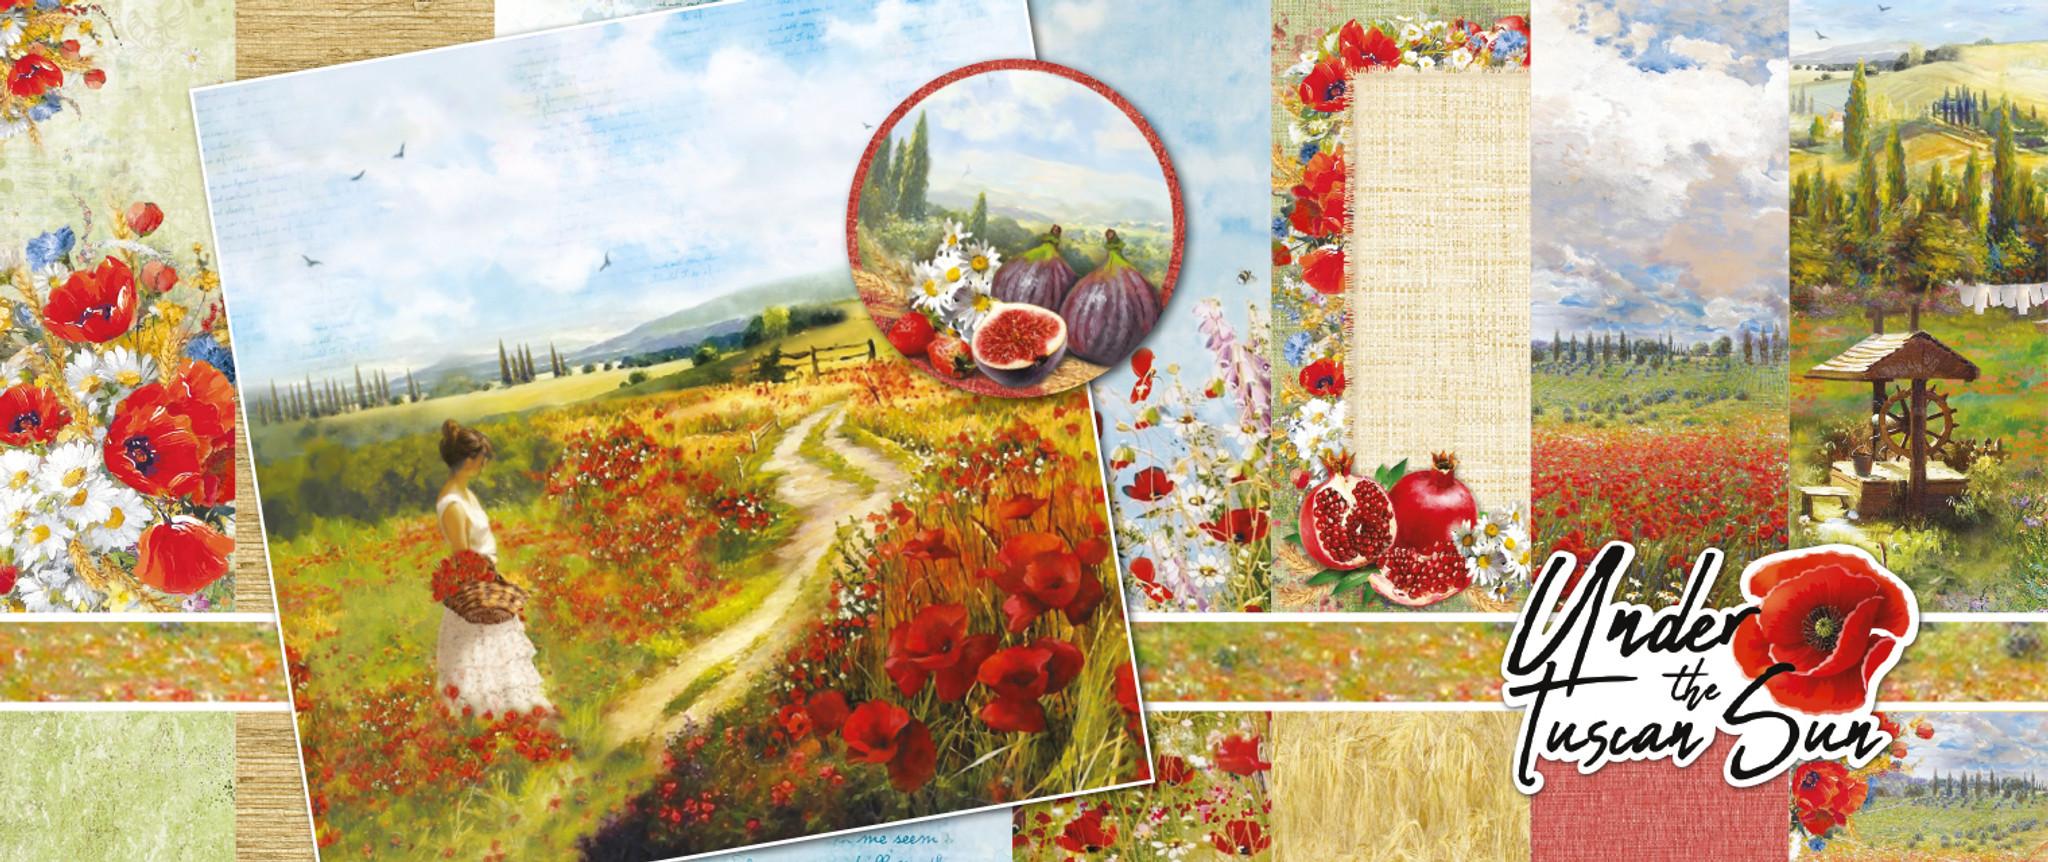 1/04 Ciao Bella - Under the Tuscan Sun